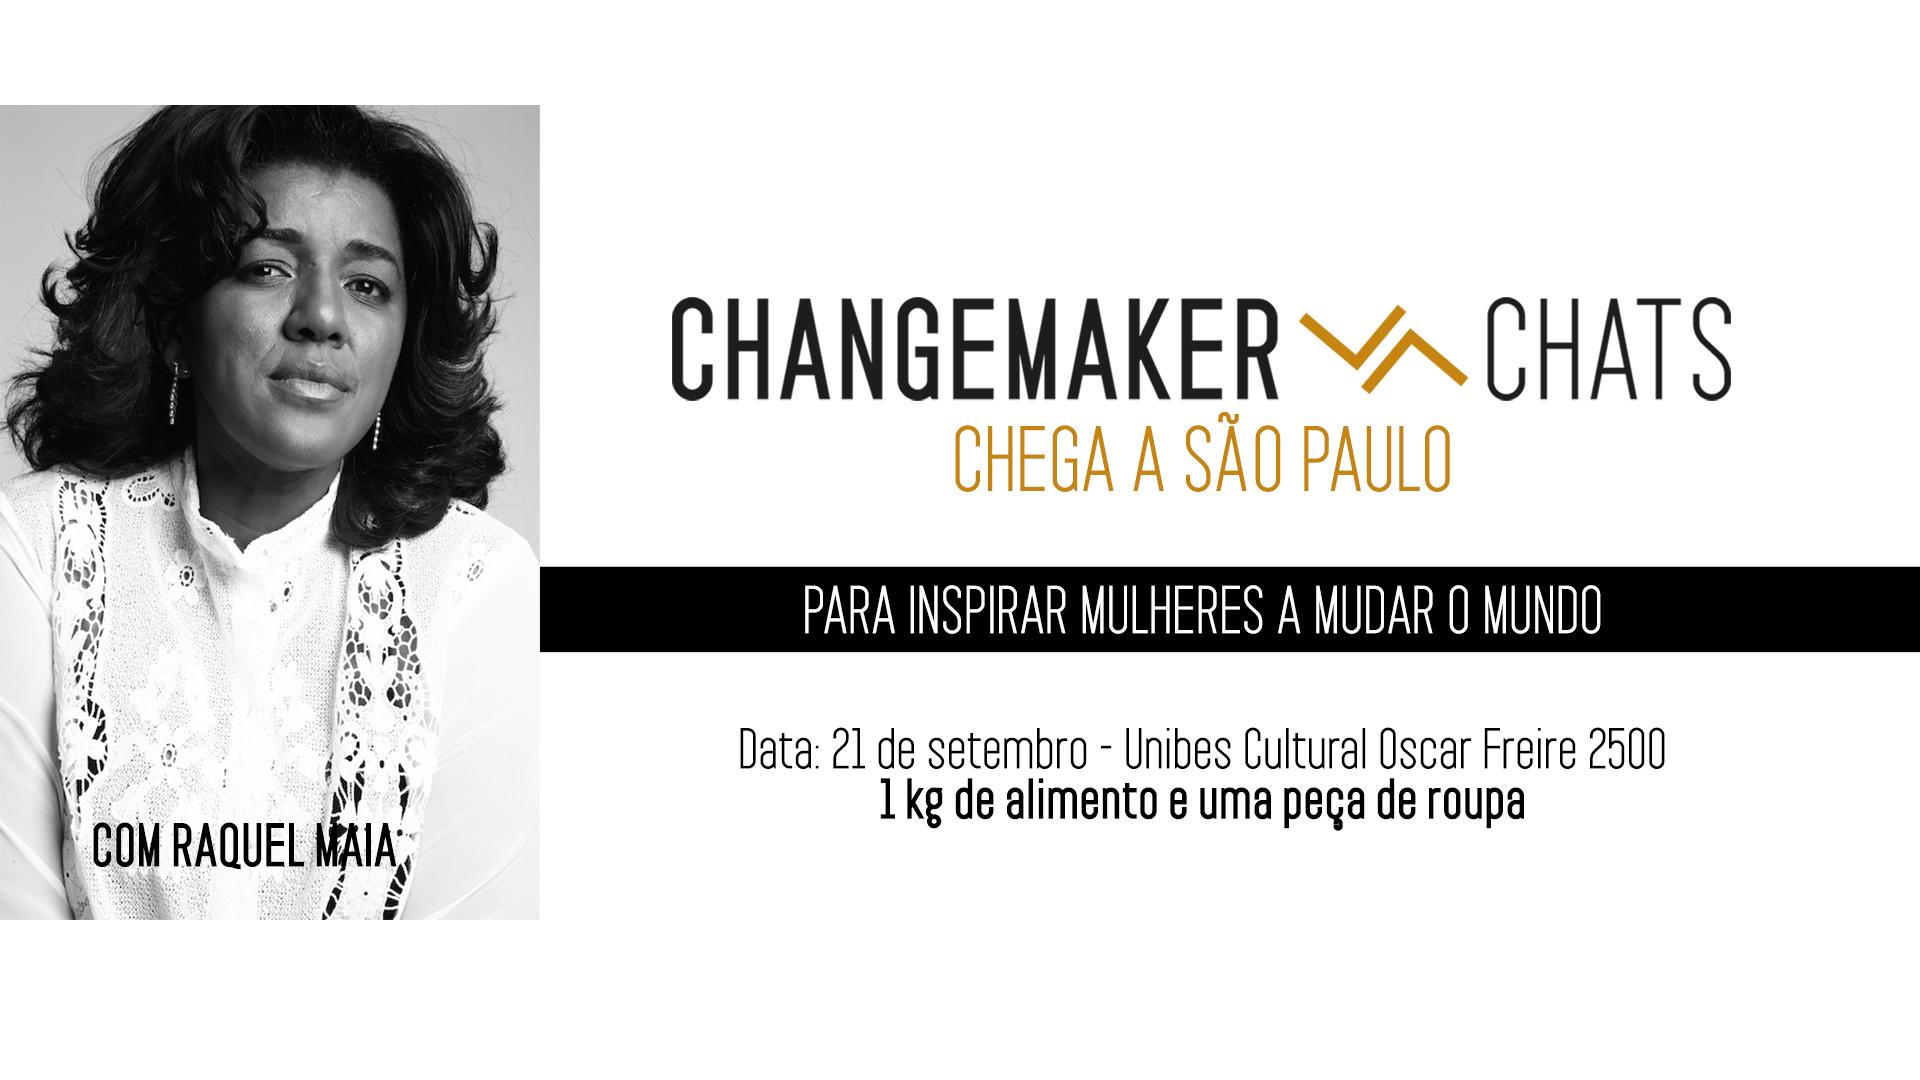 Changemaker Chats debaterá histórias de grandes líderes femininas e terá presença de Rachel Maia